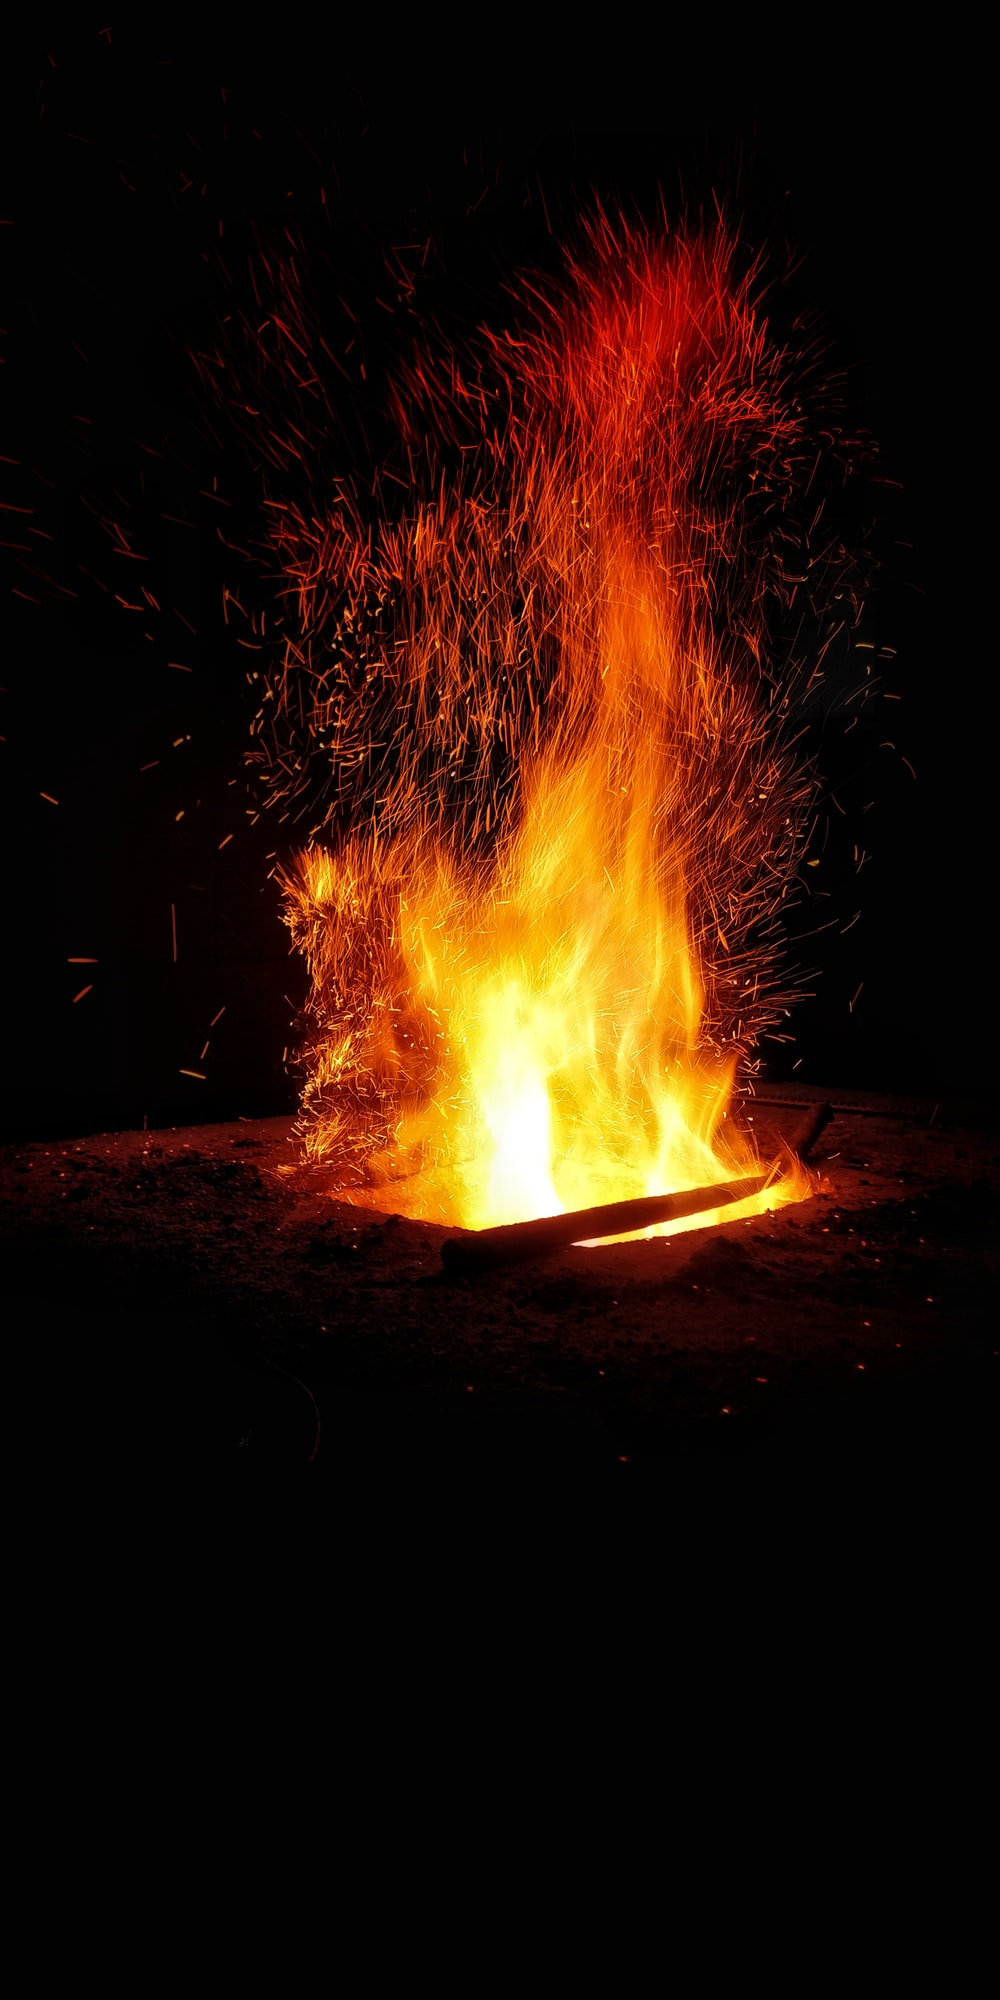 bonfire at night time